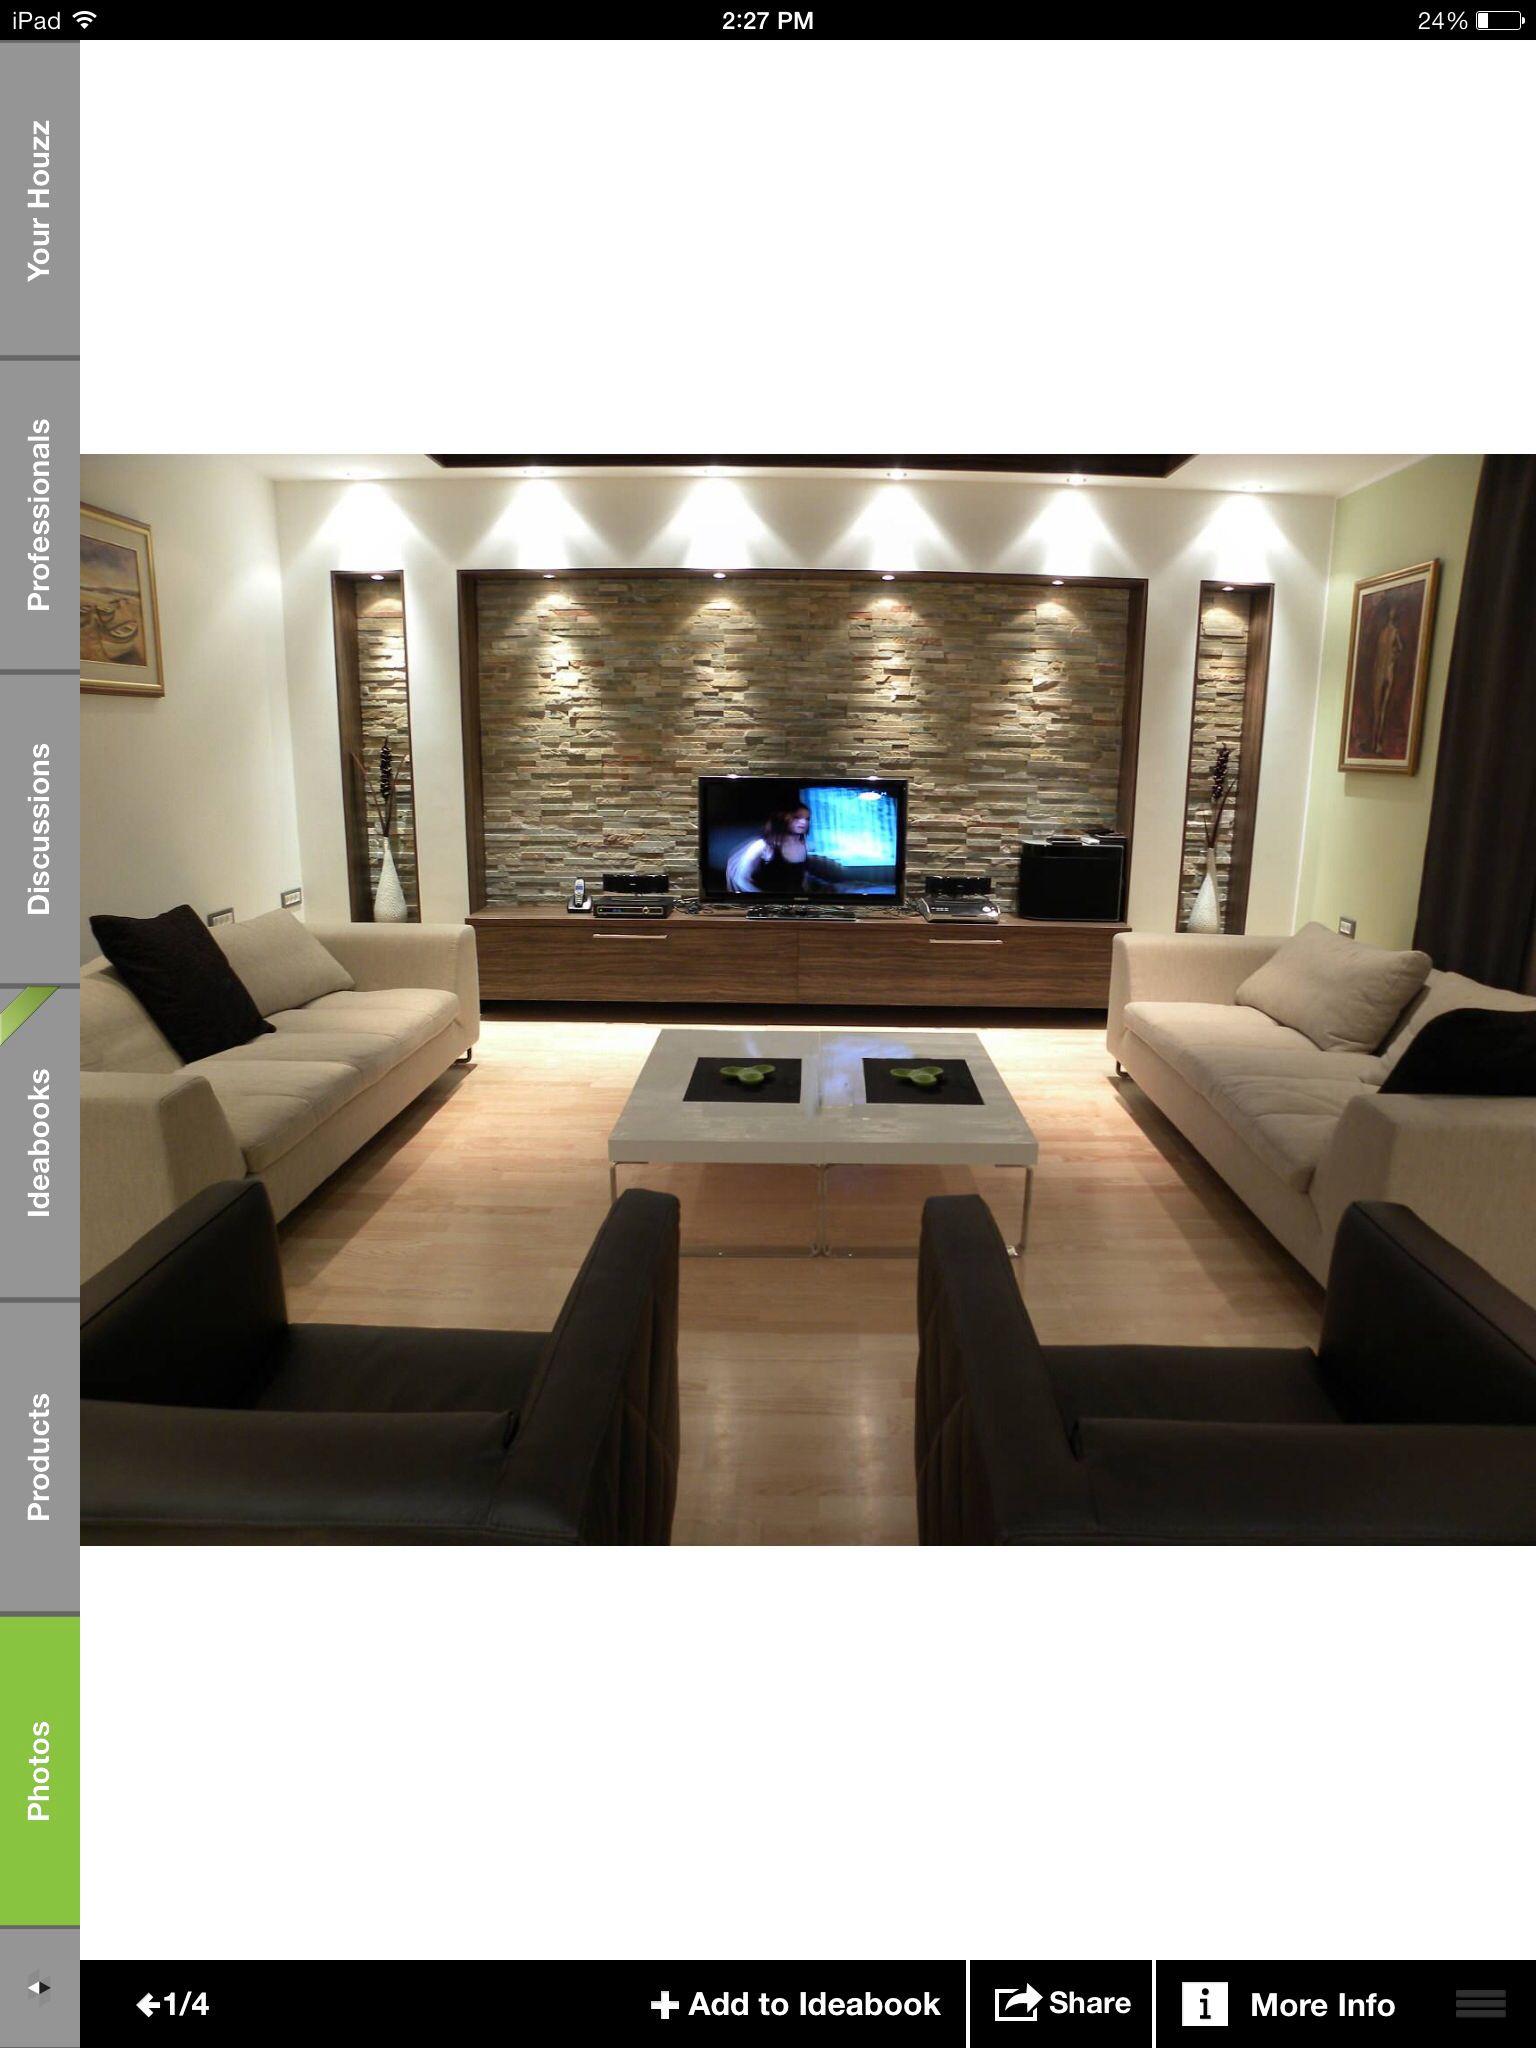 125 Living Room Design Ideas Focusing On Styles And Interior Decor Details Living Room Design Modern Home House X living room ideas